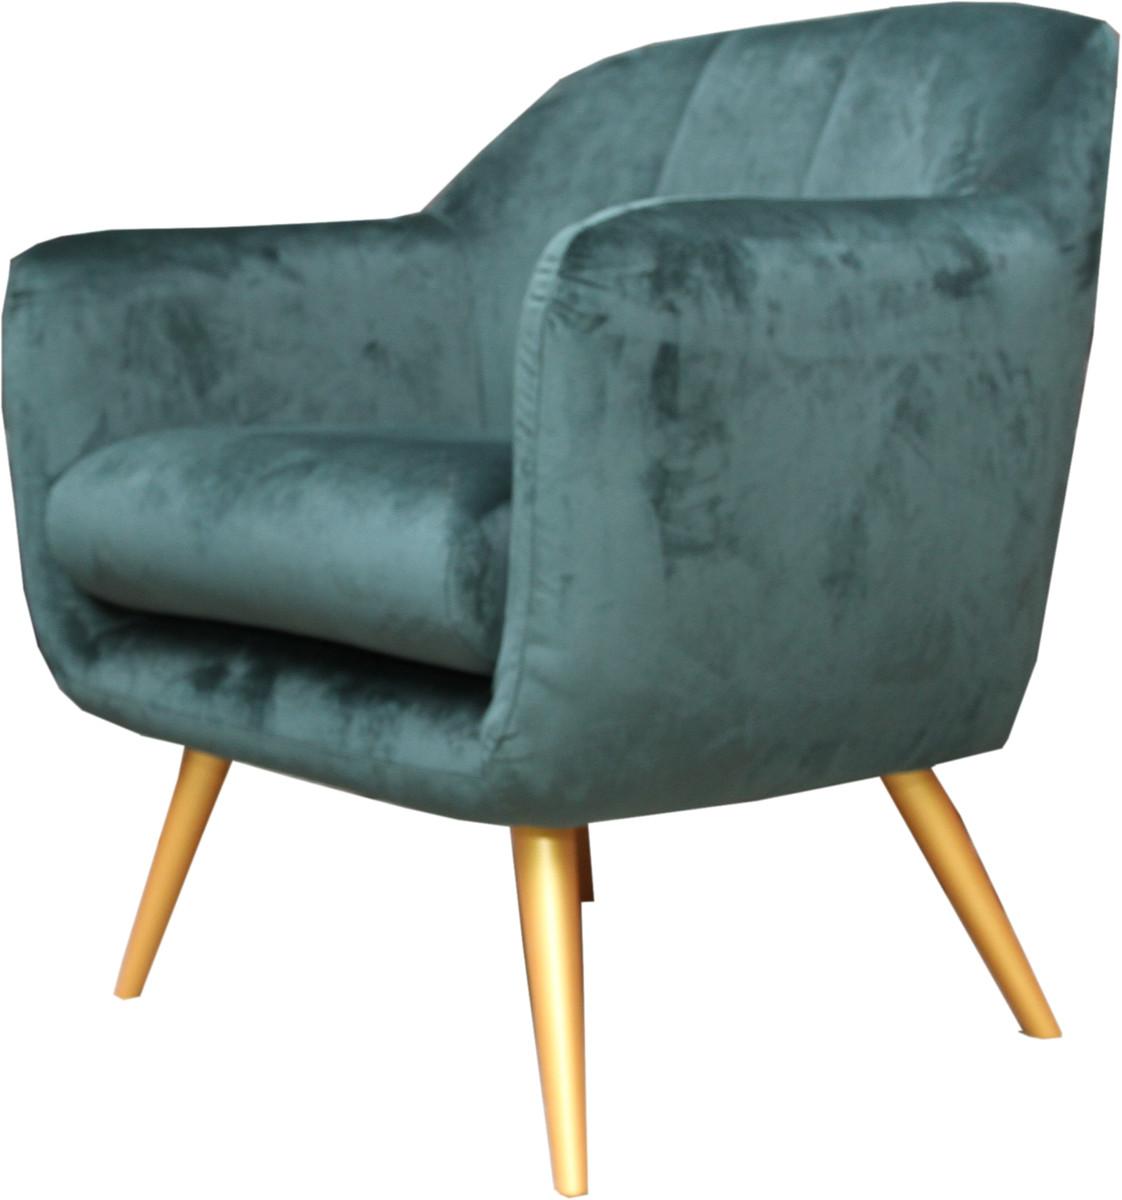 Casa Padrino Retro Salon Sessel Grun Gold Cocktailsessel 60er Jahre Stuhl Mobel